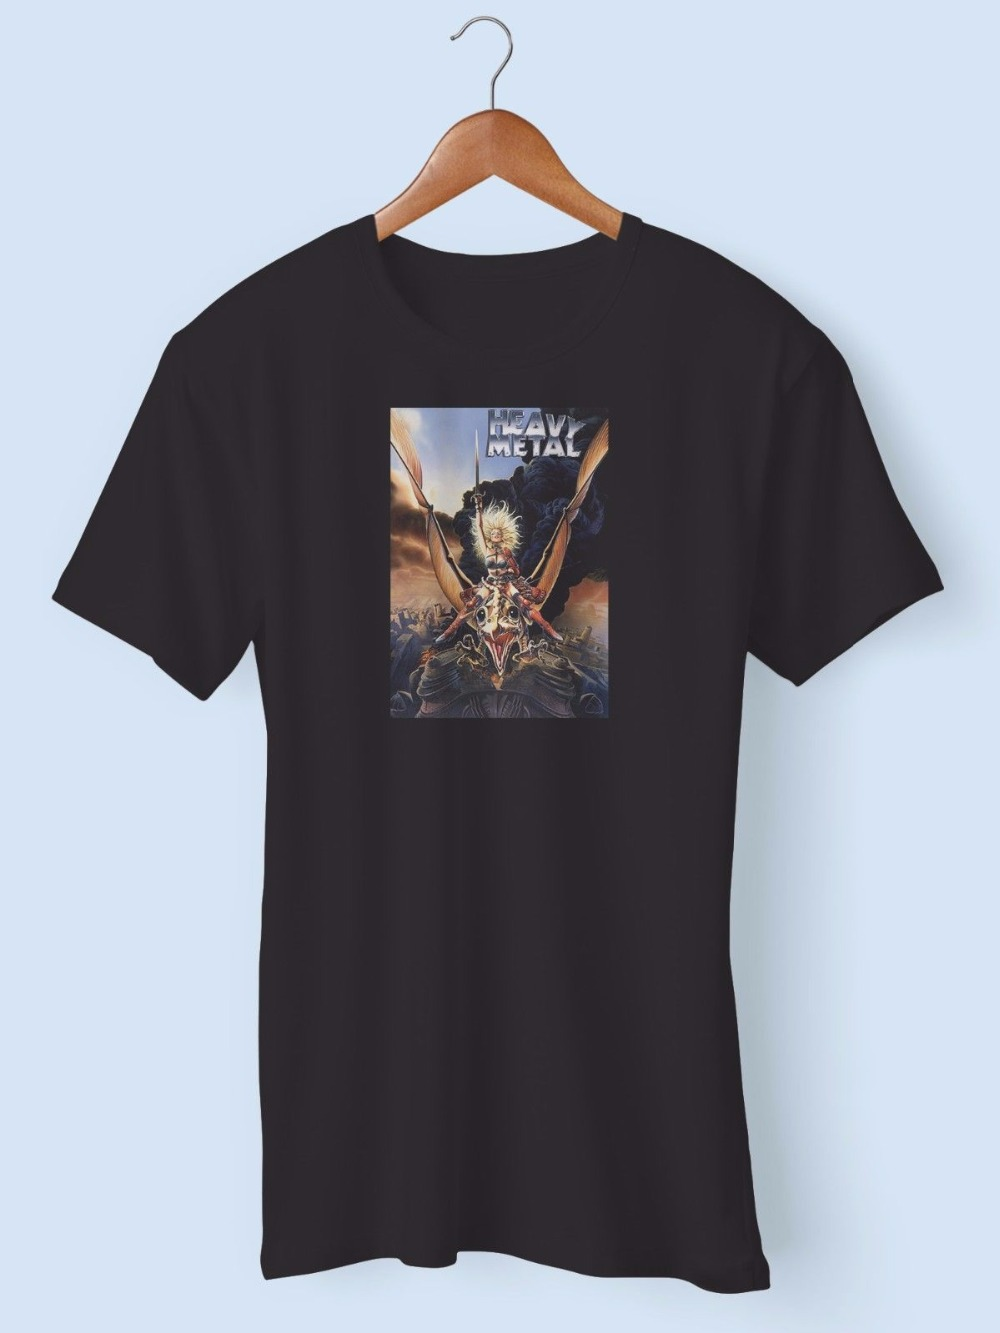 Poster design xxl - T Shirt Hot Sale Clothes O Neck Short Heavy Metal Vintage Movie Poster Black Size S To Xxl Design T Shirts For Men